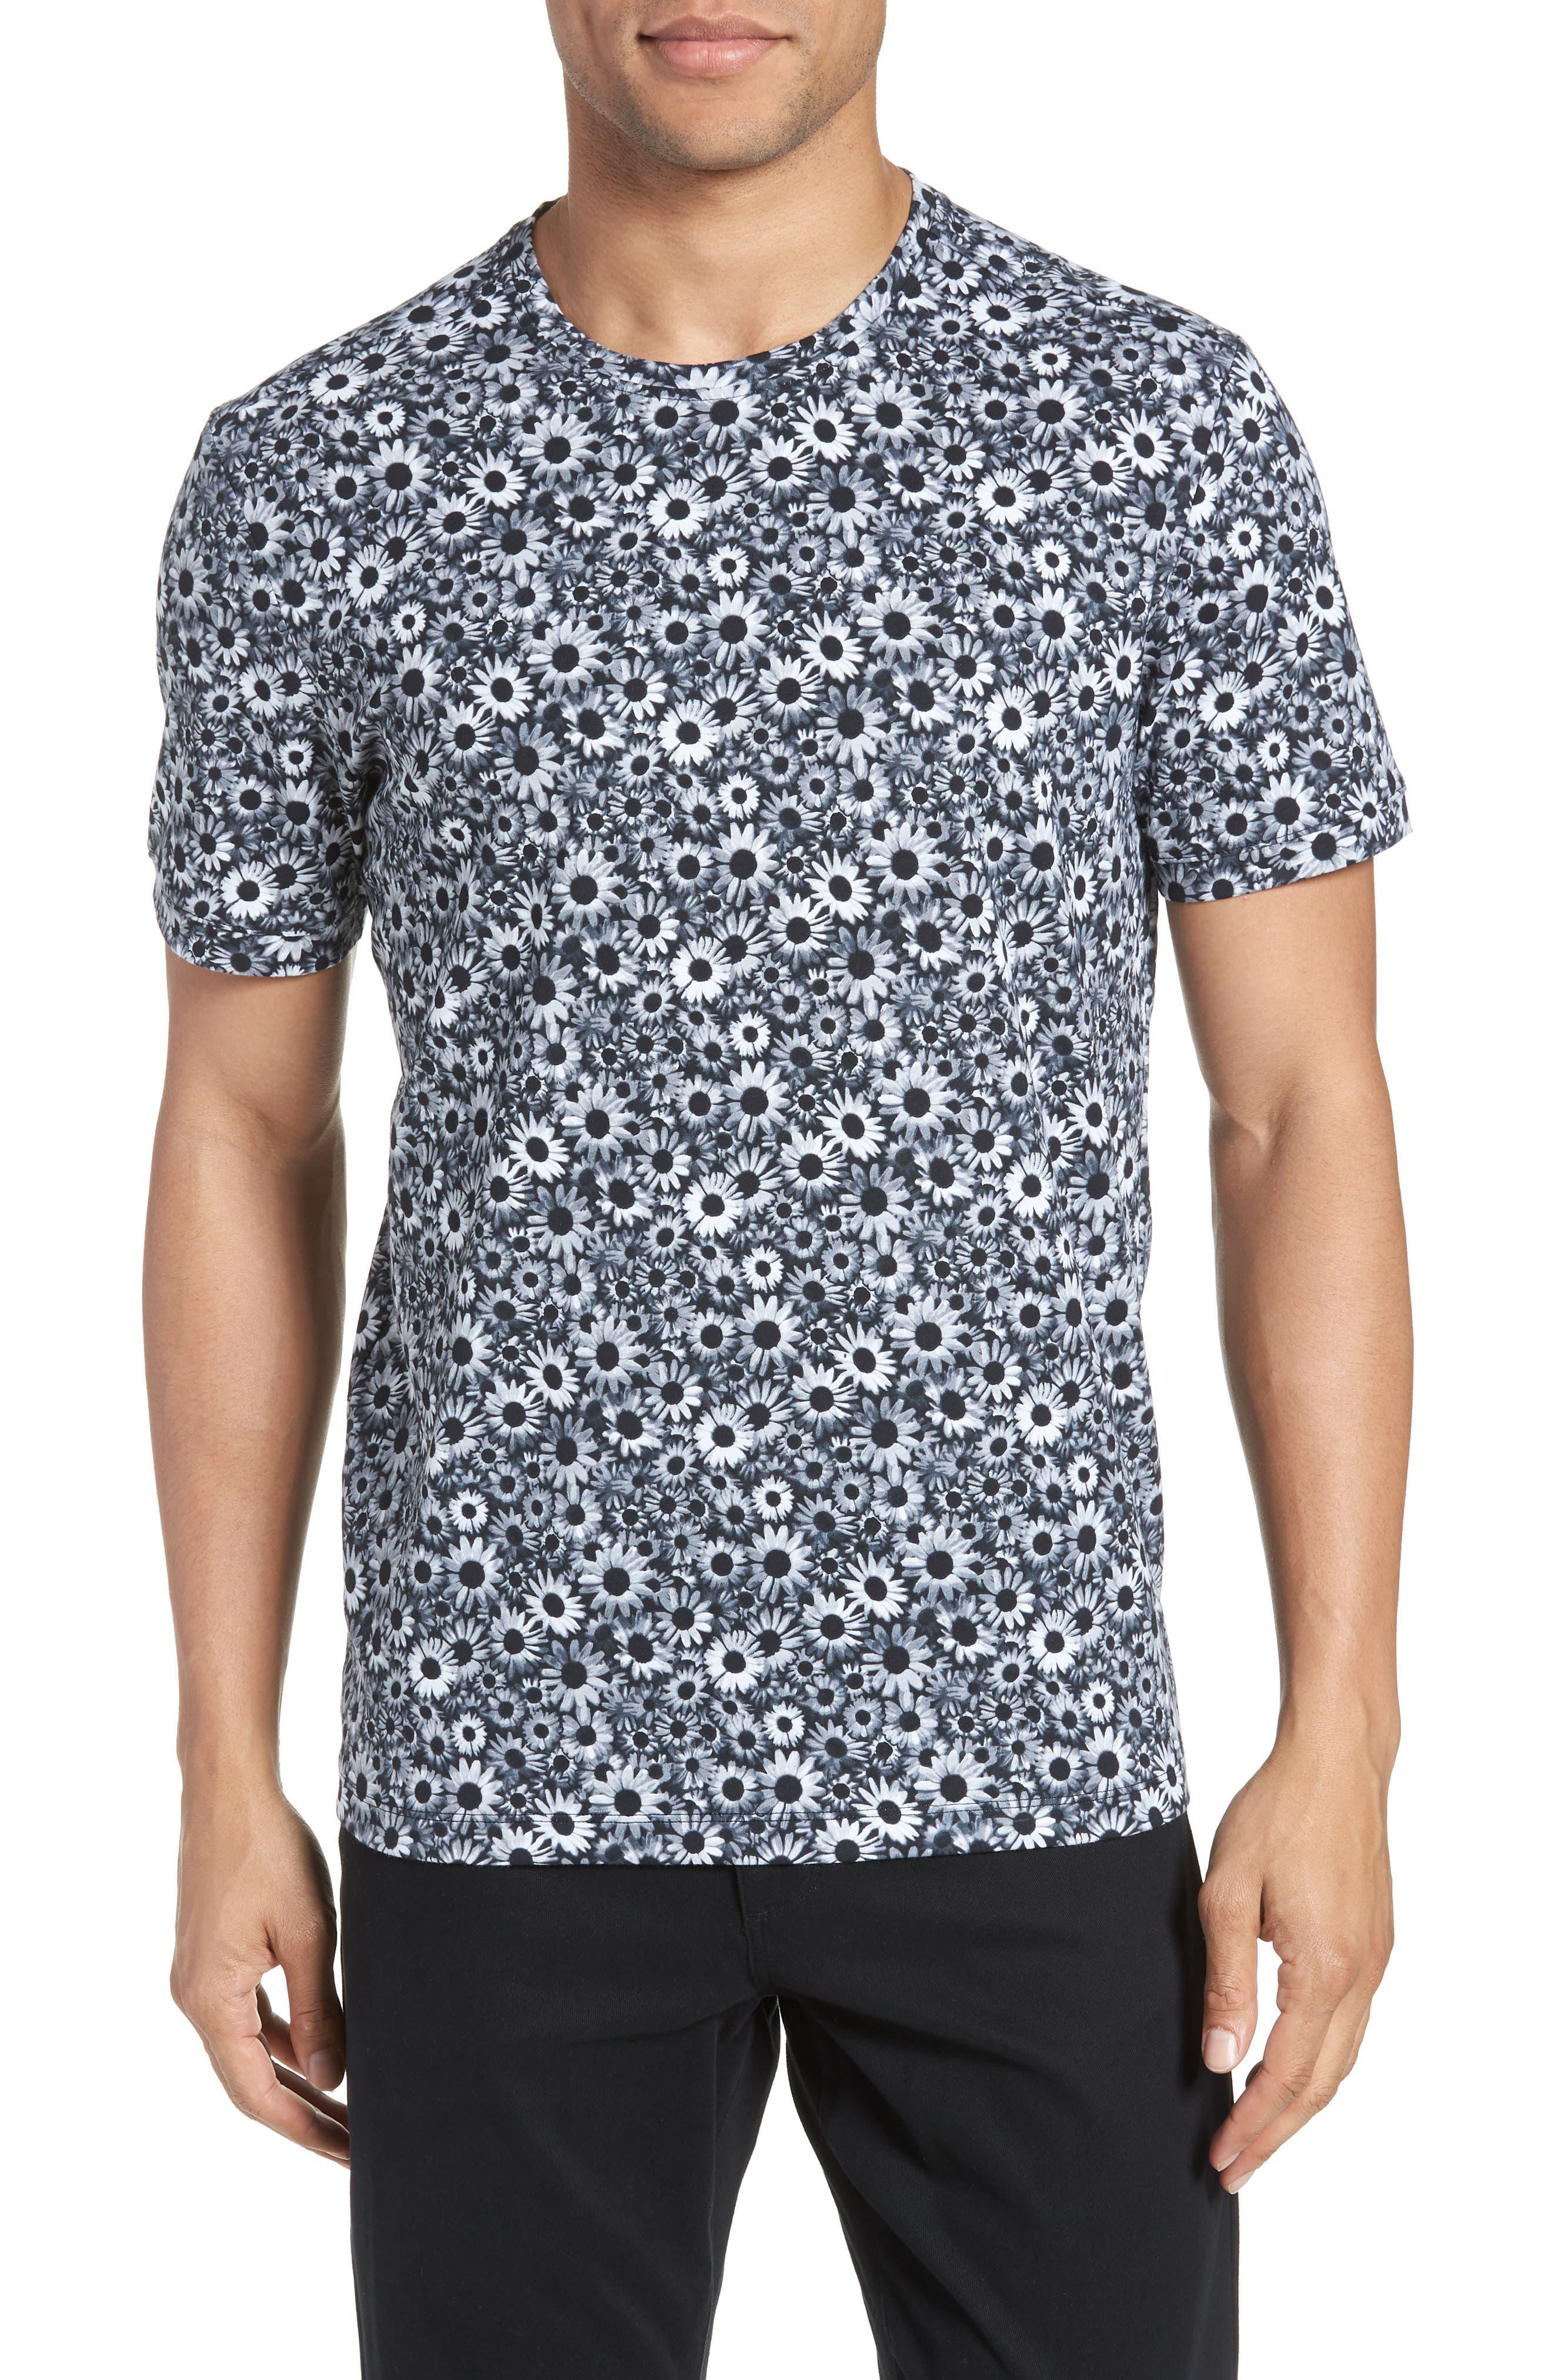 Print T-Shirt,                         Main,                         color, BLACK WHITE DAISY FLORAL